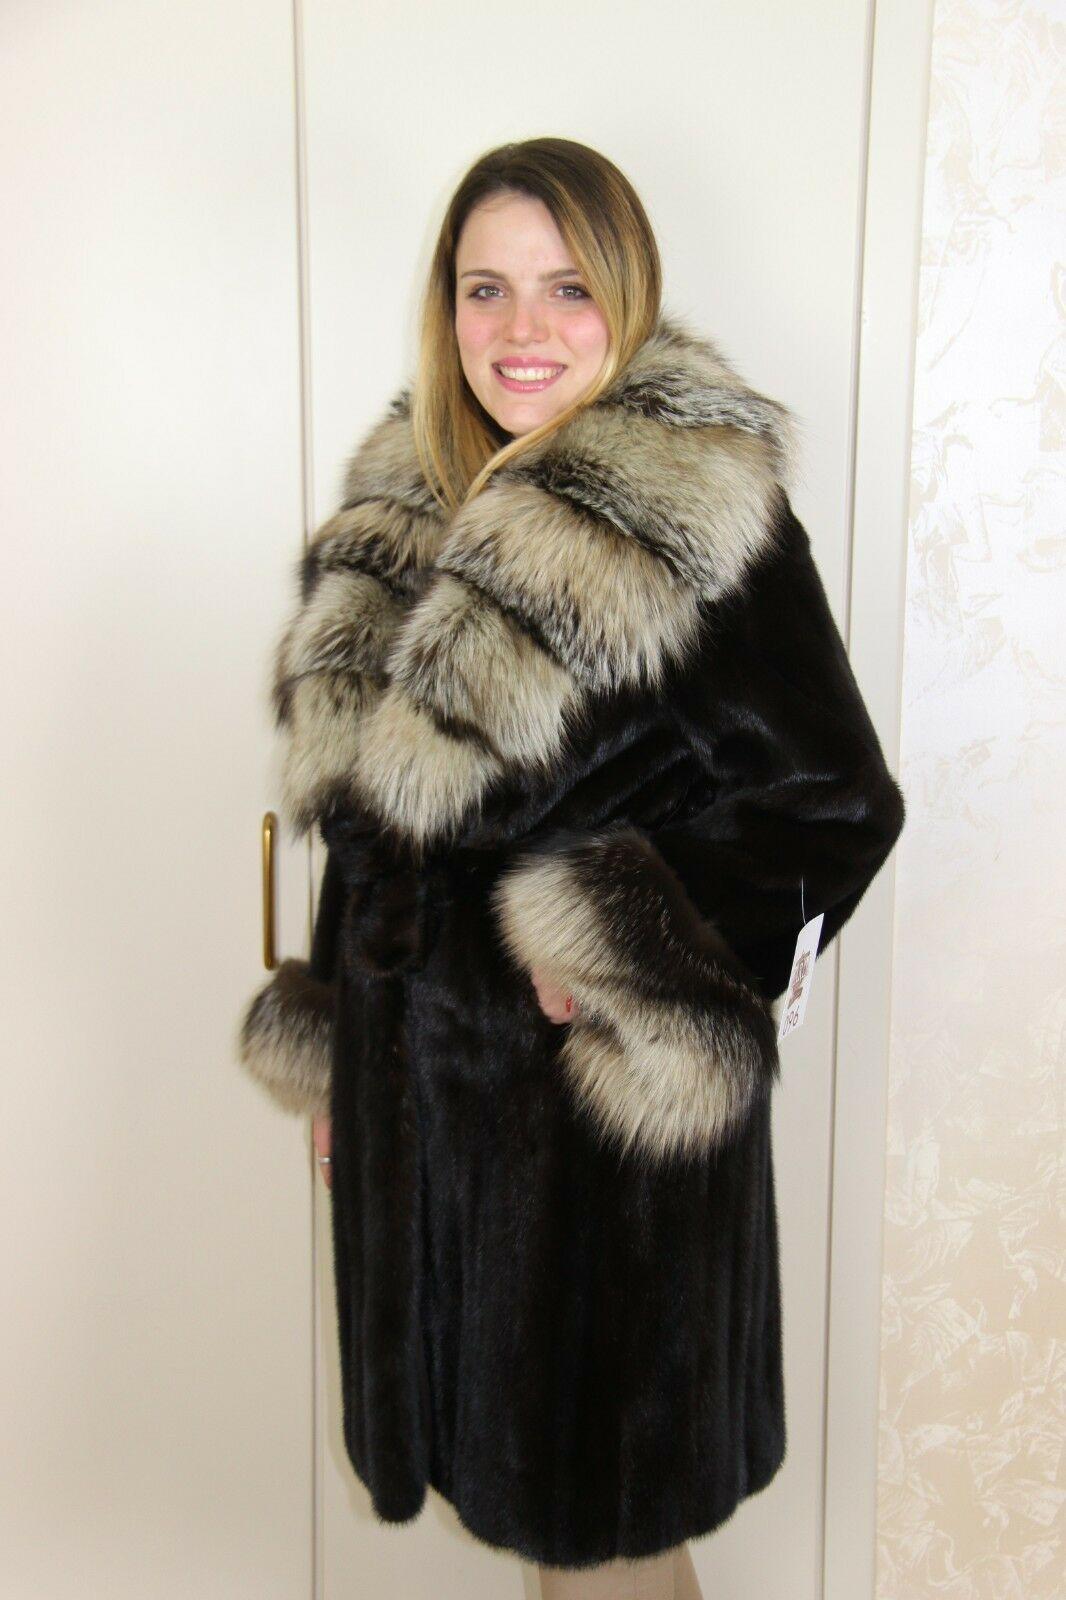 half off 49d68 01b5f Details about Mink Coat Hooded Fox Pelliccia Visone Fuchs ...